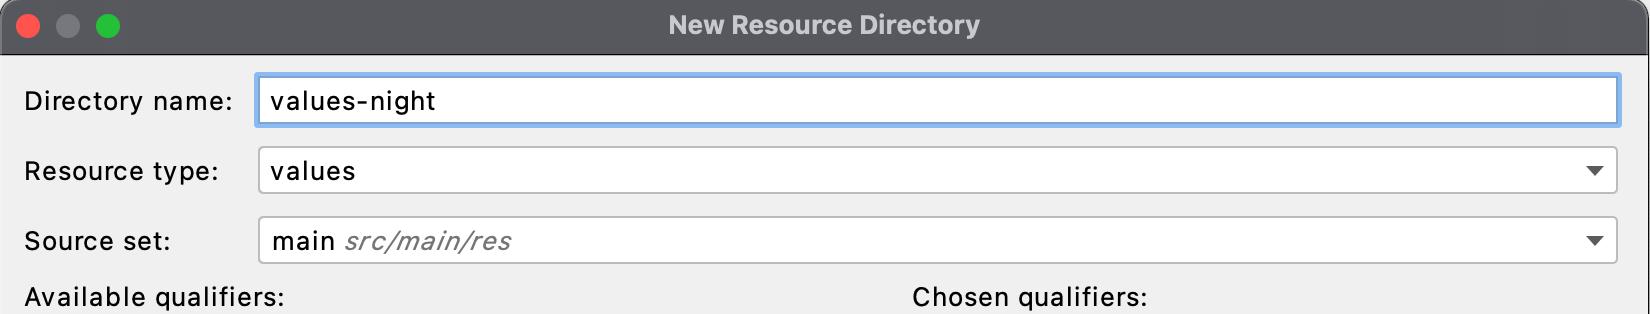 Figure 14.8 — New Resource Directory